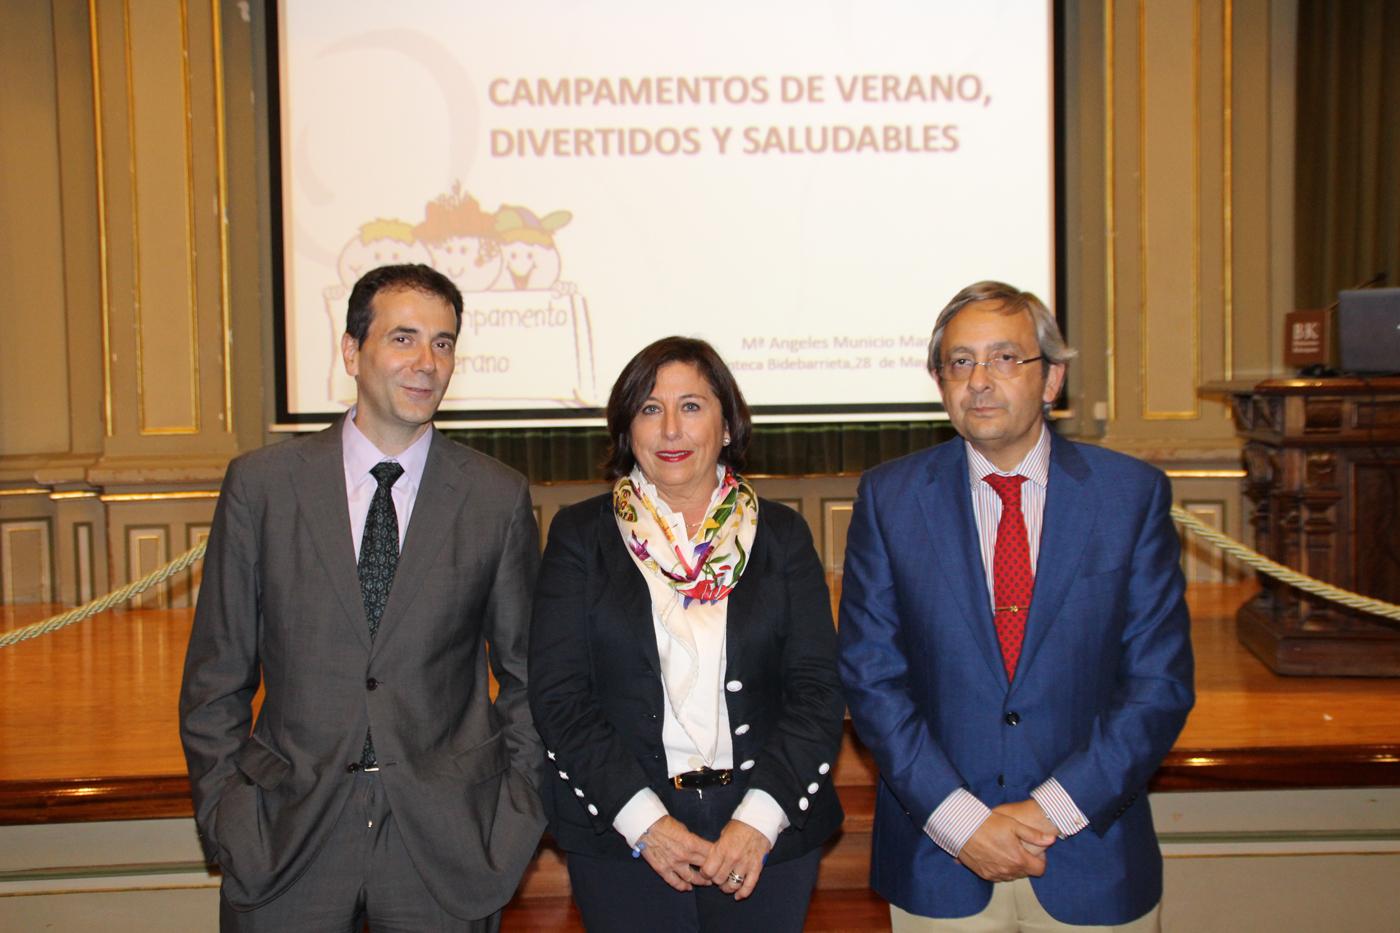 Fermín Apezteguía, Marian Municio, Juan Goiria